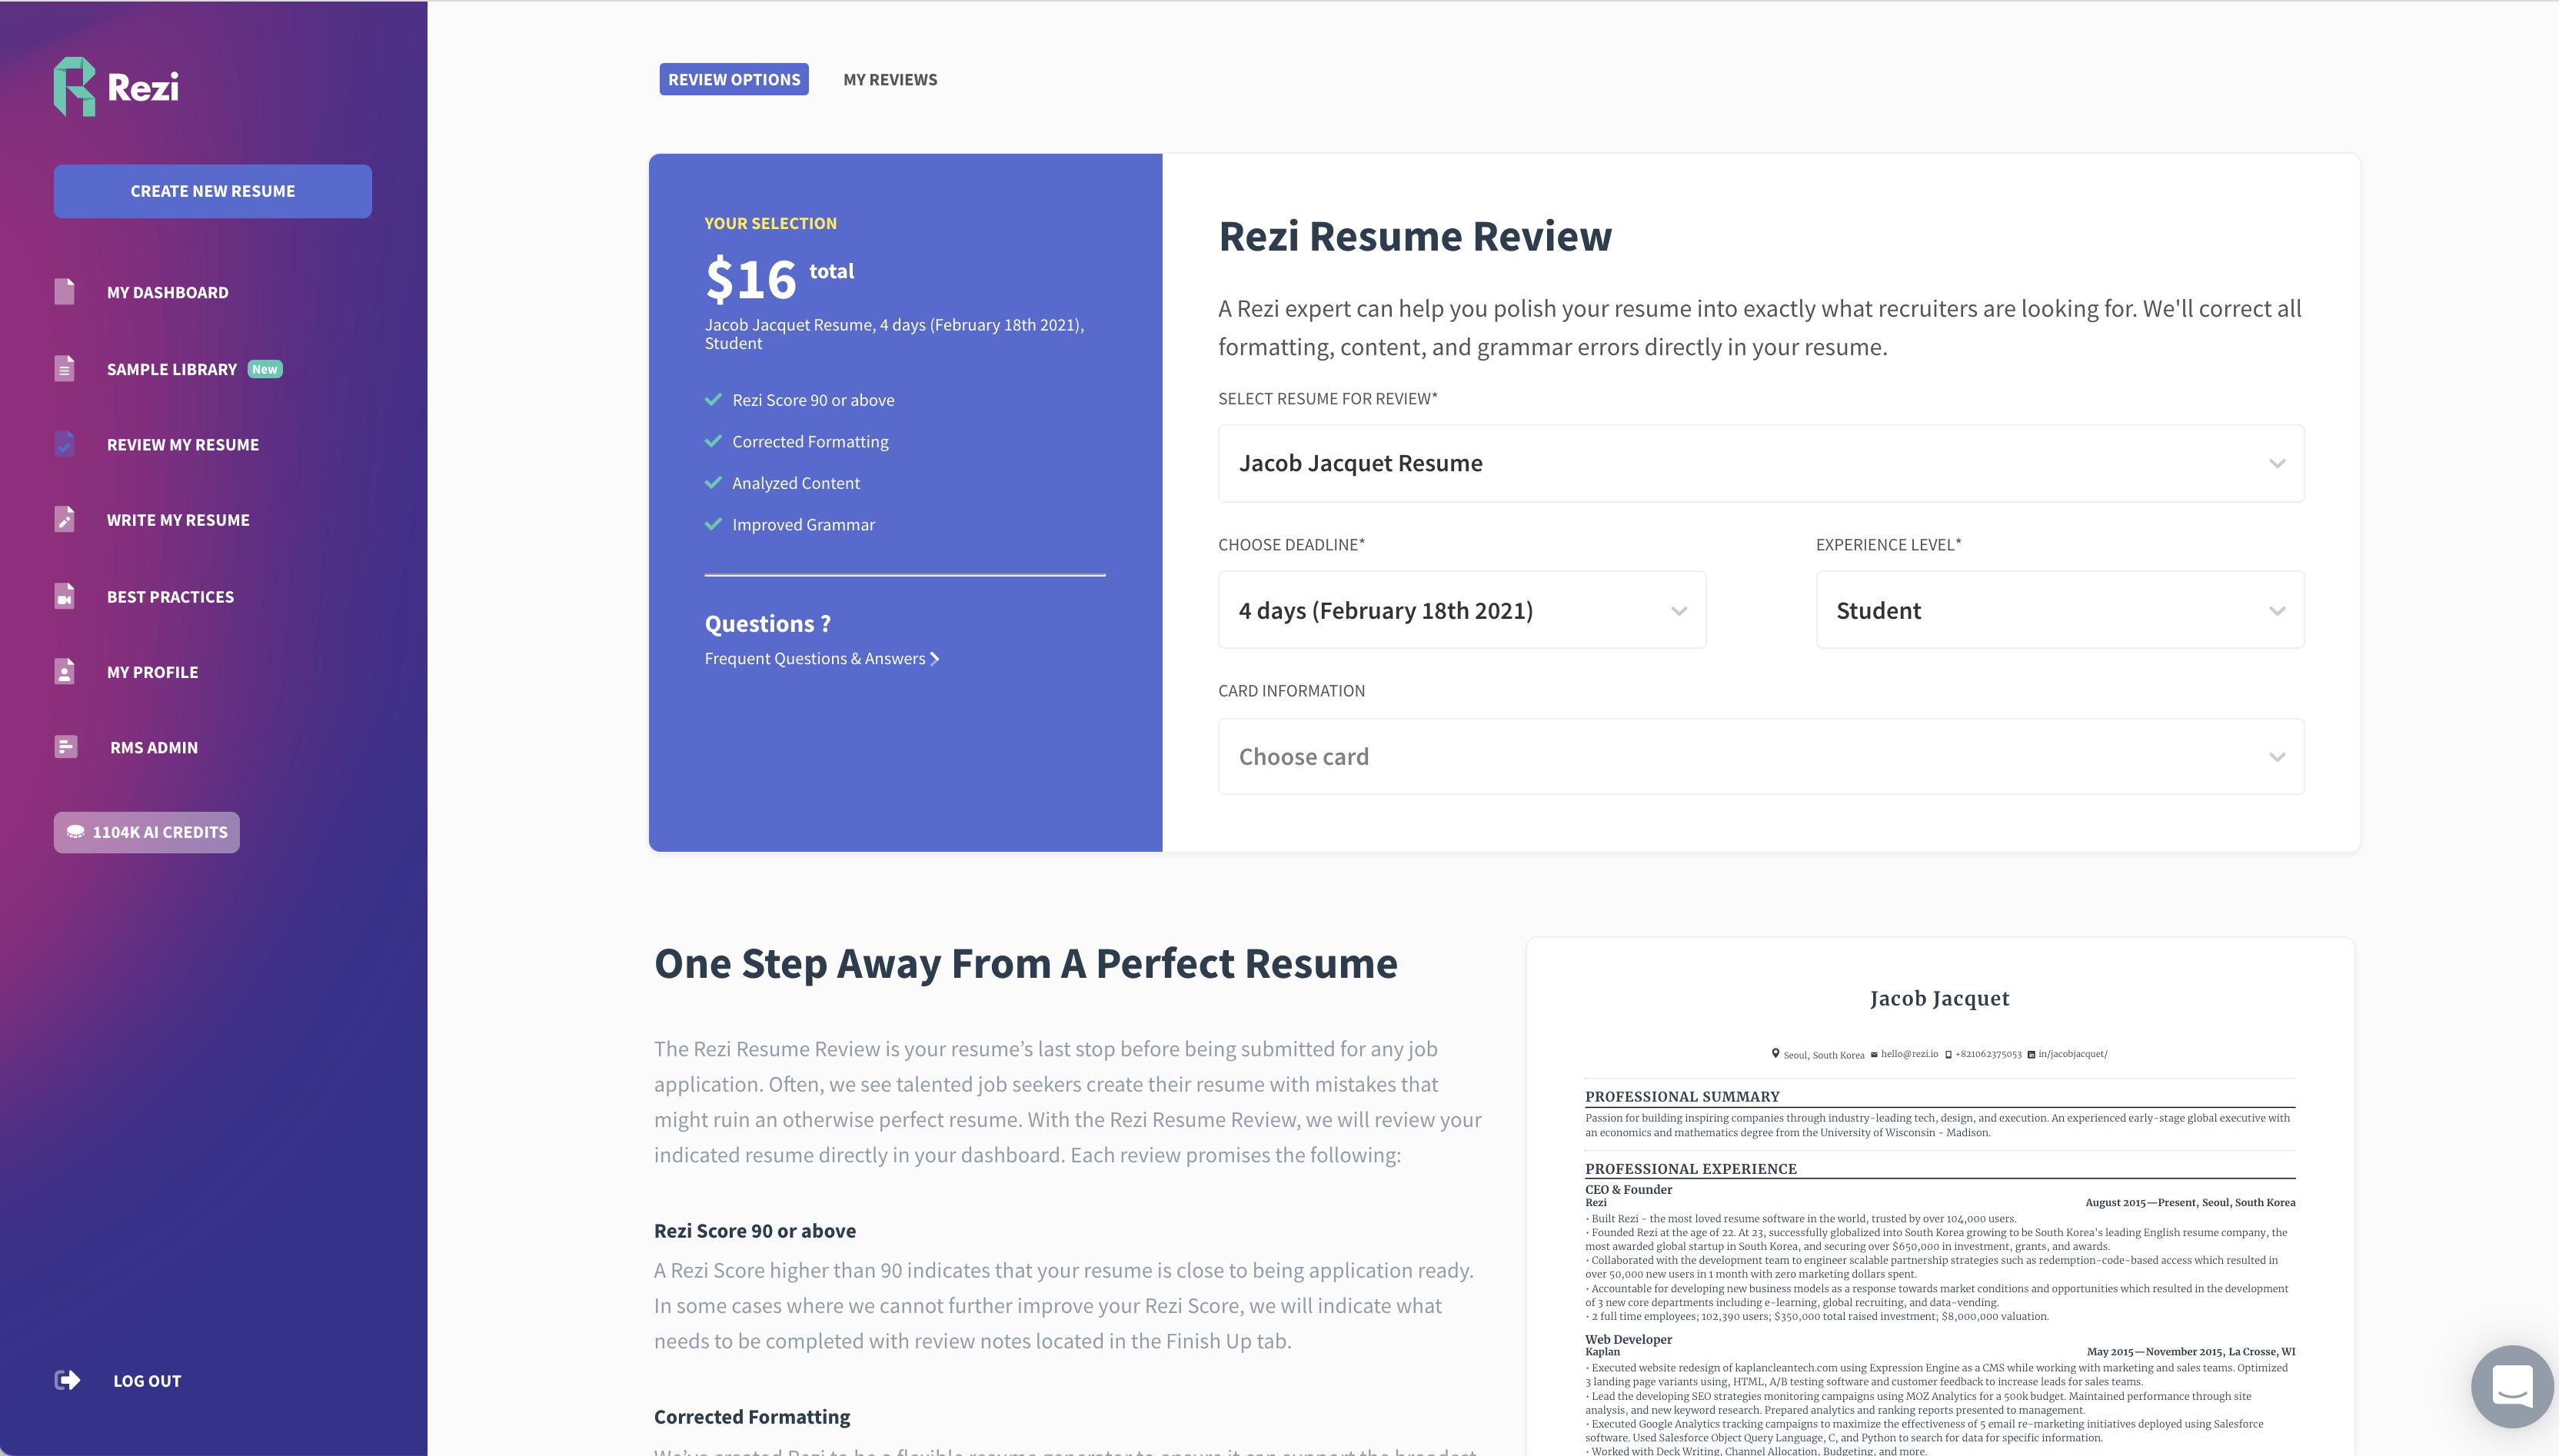 Rezi Resume Review